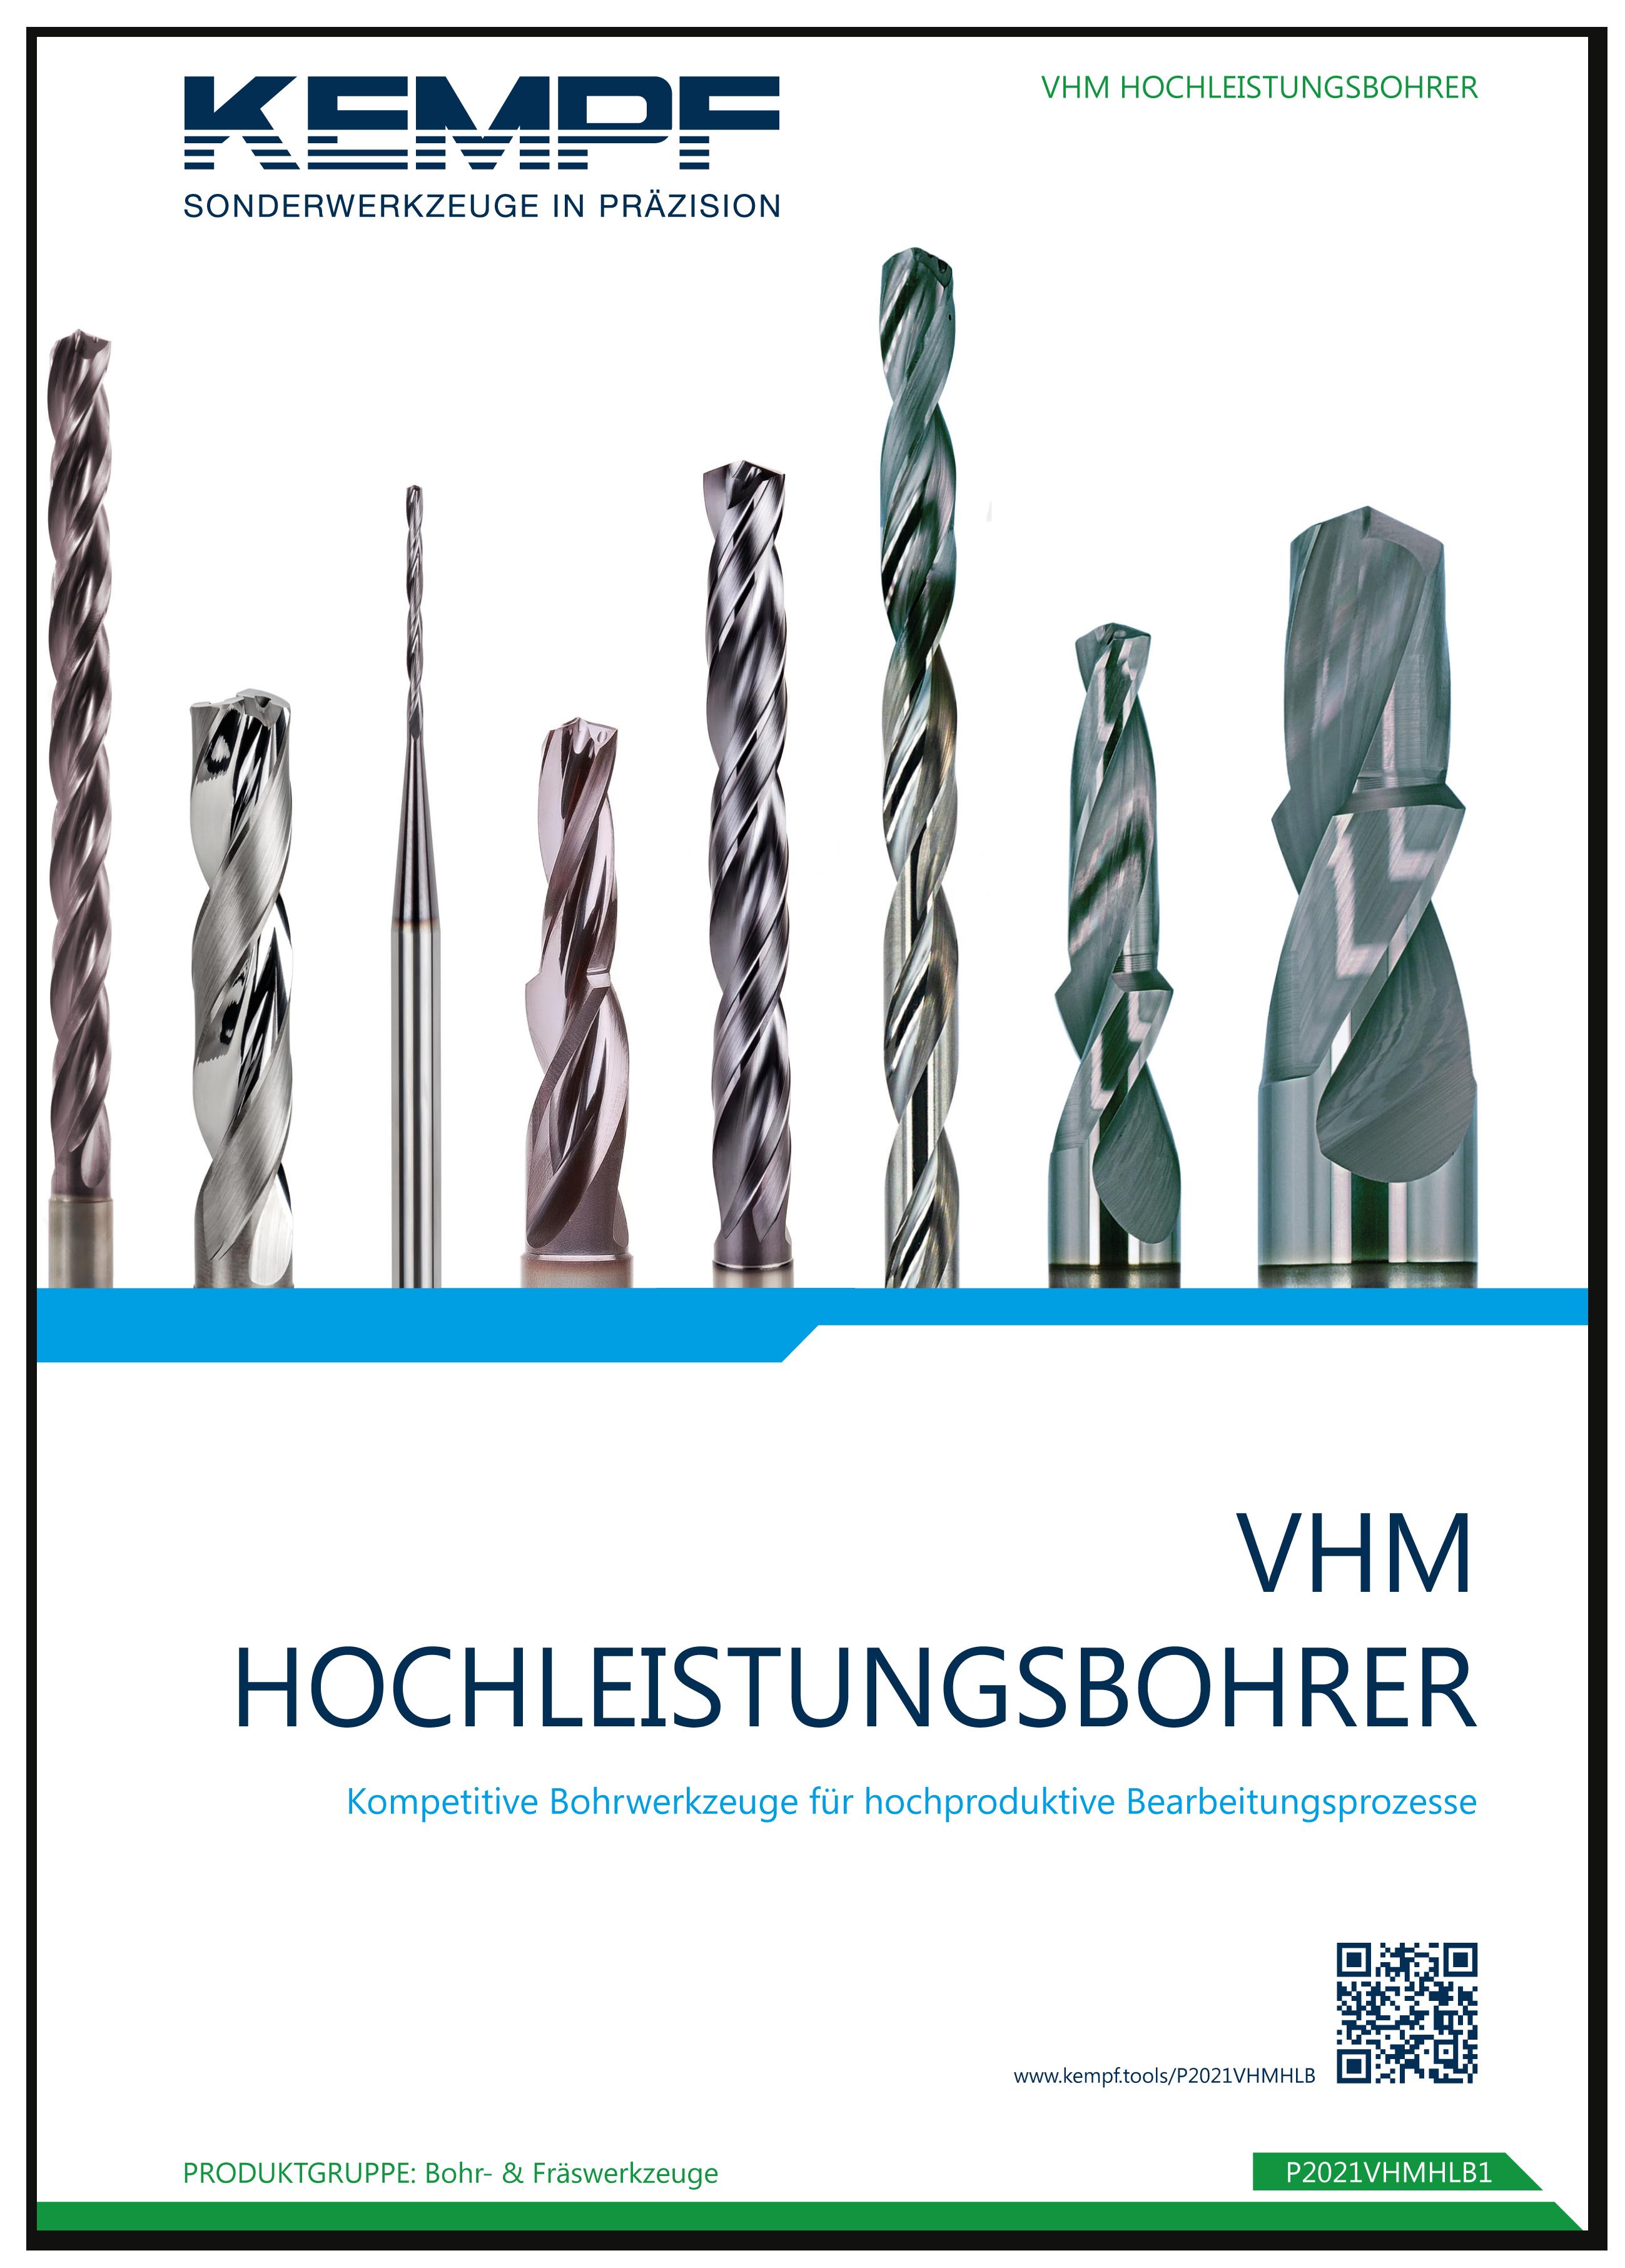 BOHR-FR-SWERKZEUGE-VHM-HochleistungsbohrerP2021VHMHLB1